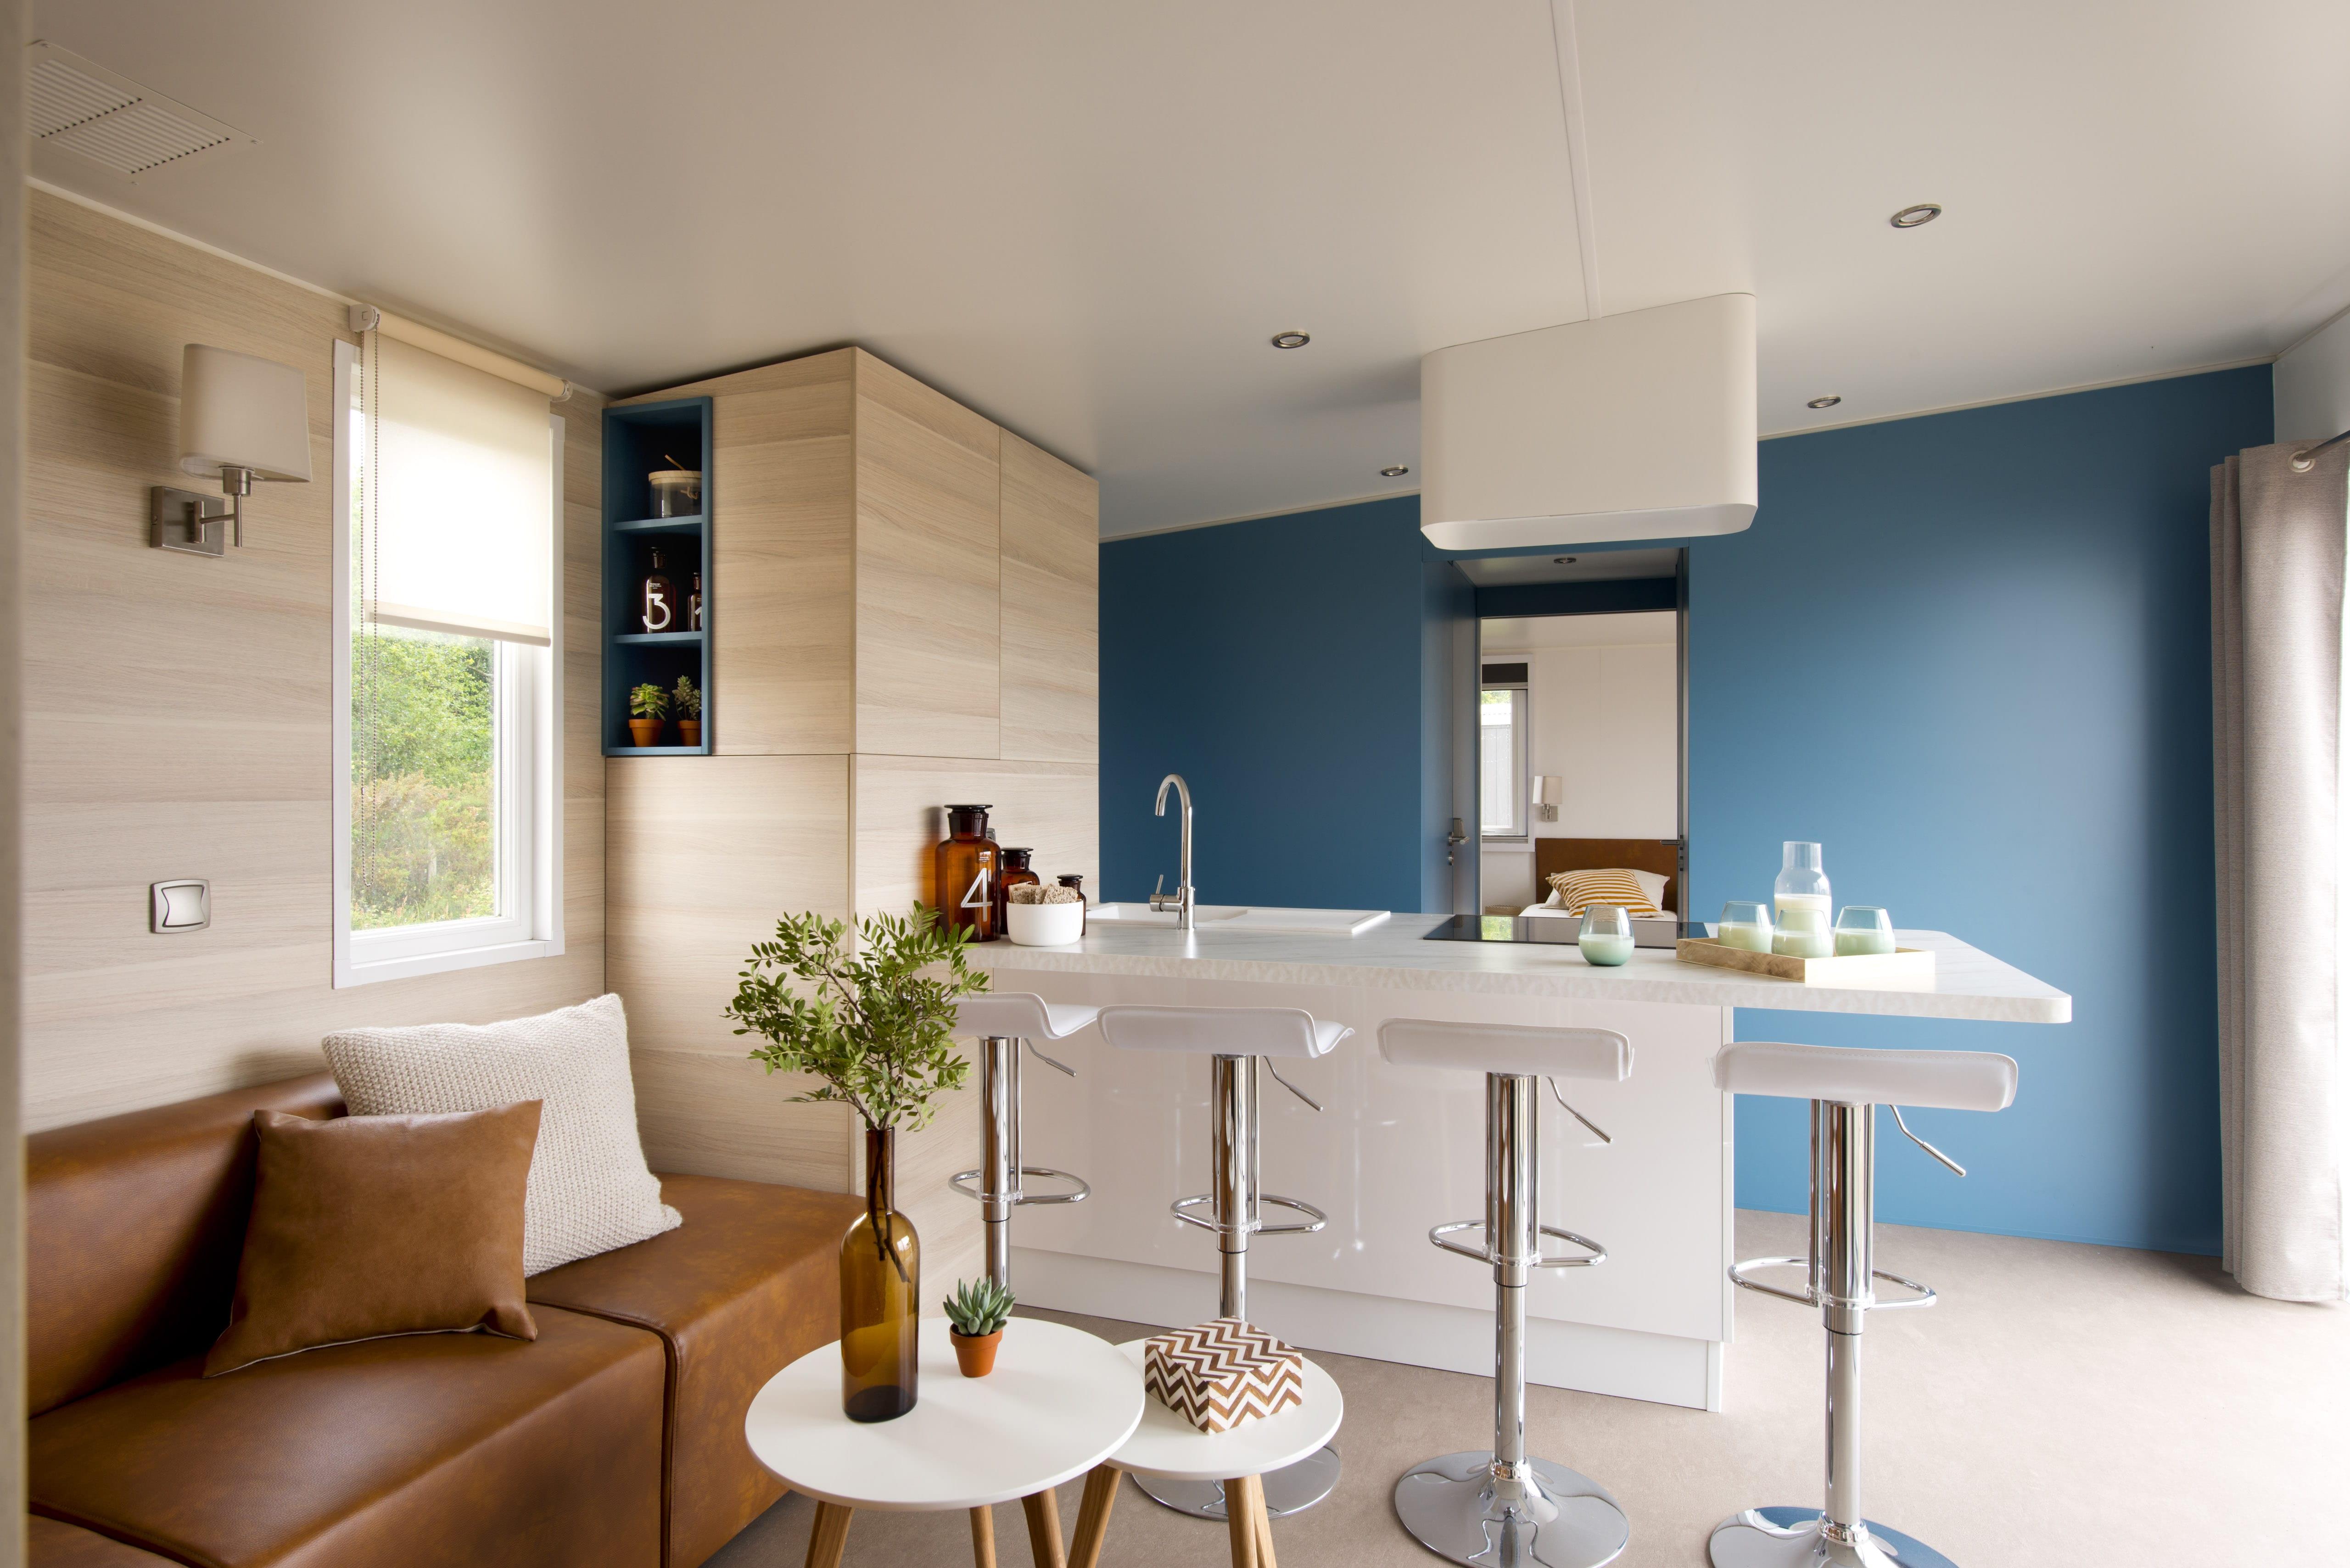 KEY WEST 2CH - Mobil home neuf - RESIDENTIEL - Zen Mobil homes